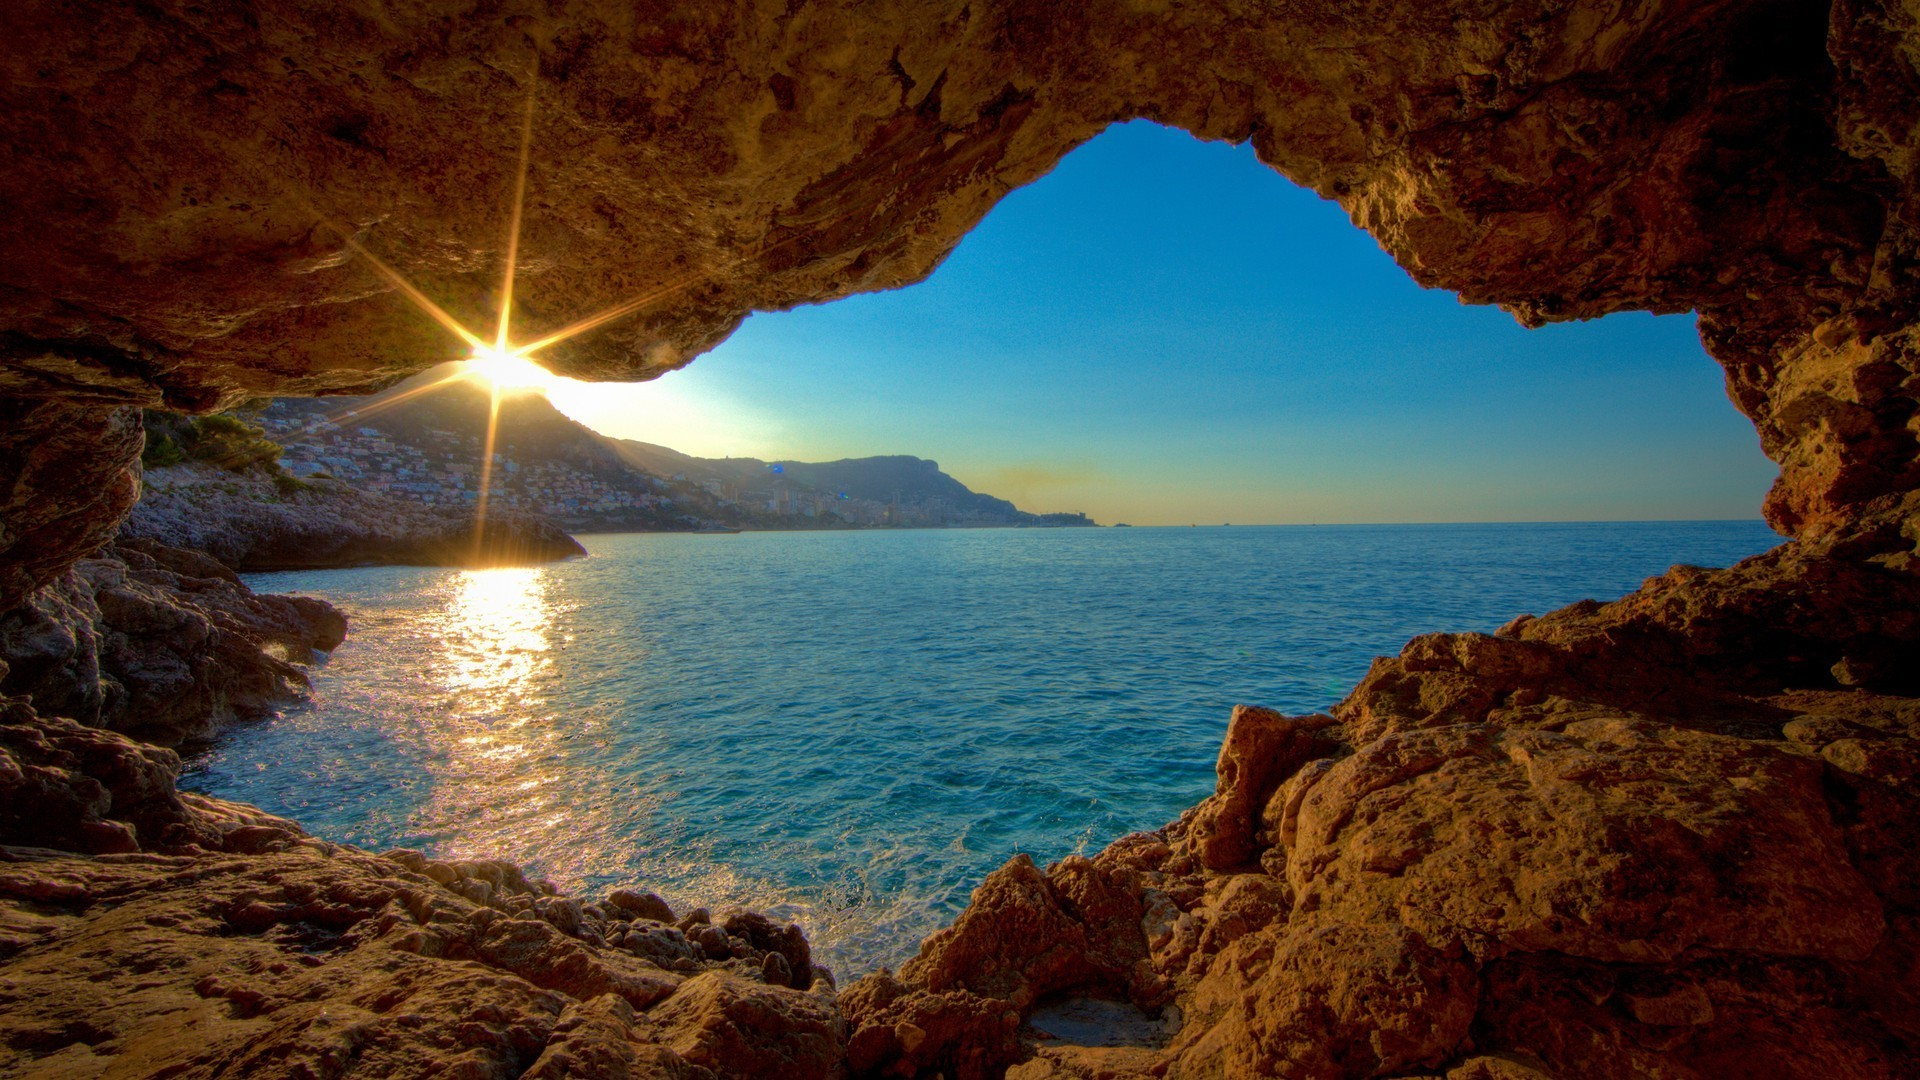 Caves Wallpaper Widescreen (62+ images)